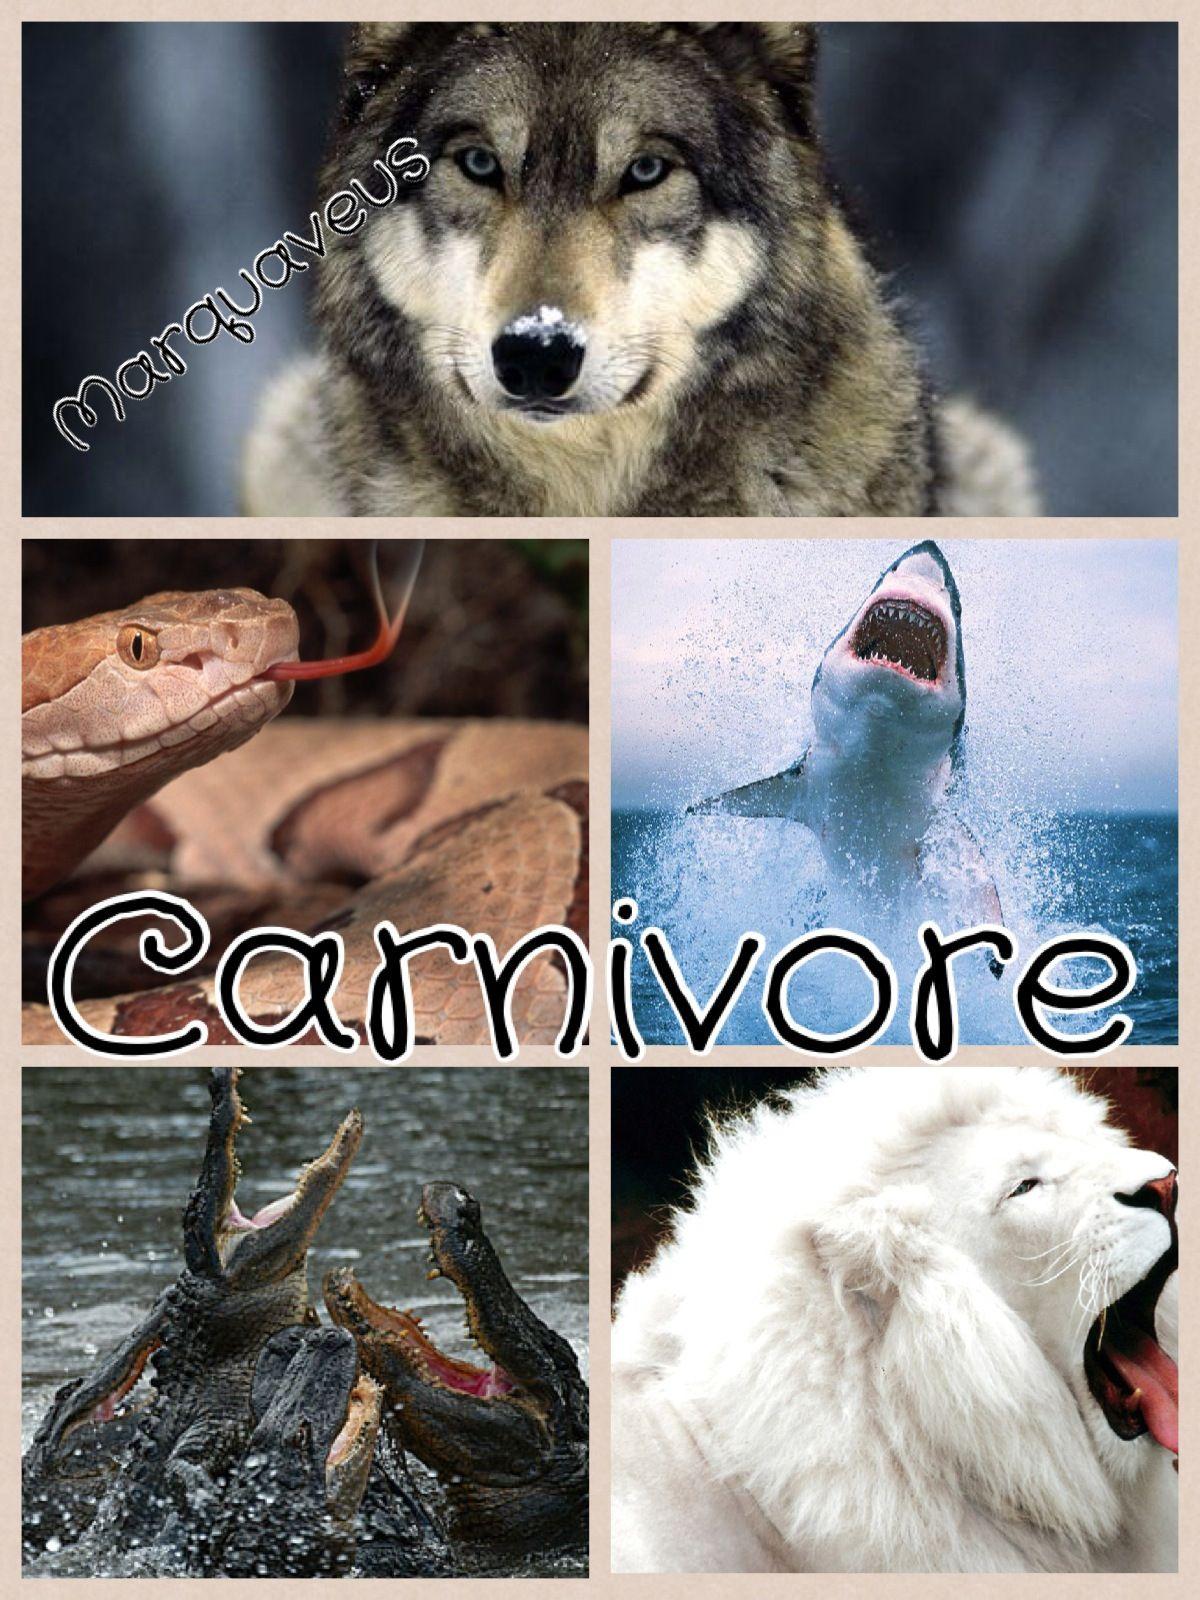 Carnivore, Herbivore, Omnivore, Oh My! Animal science